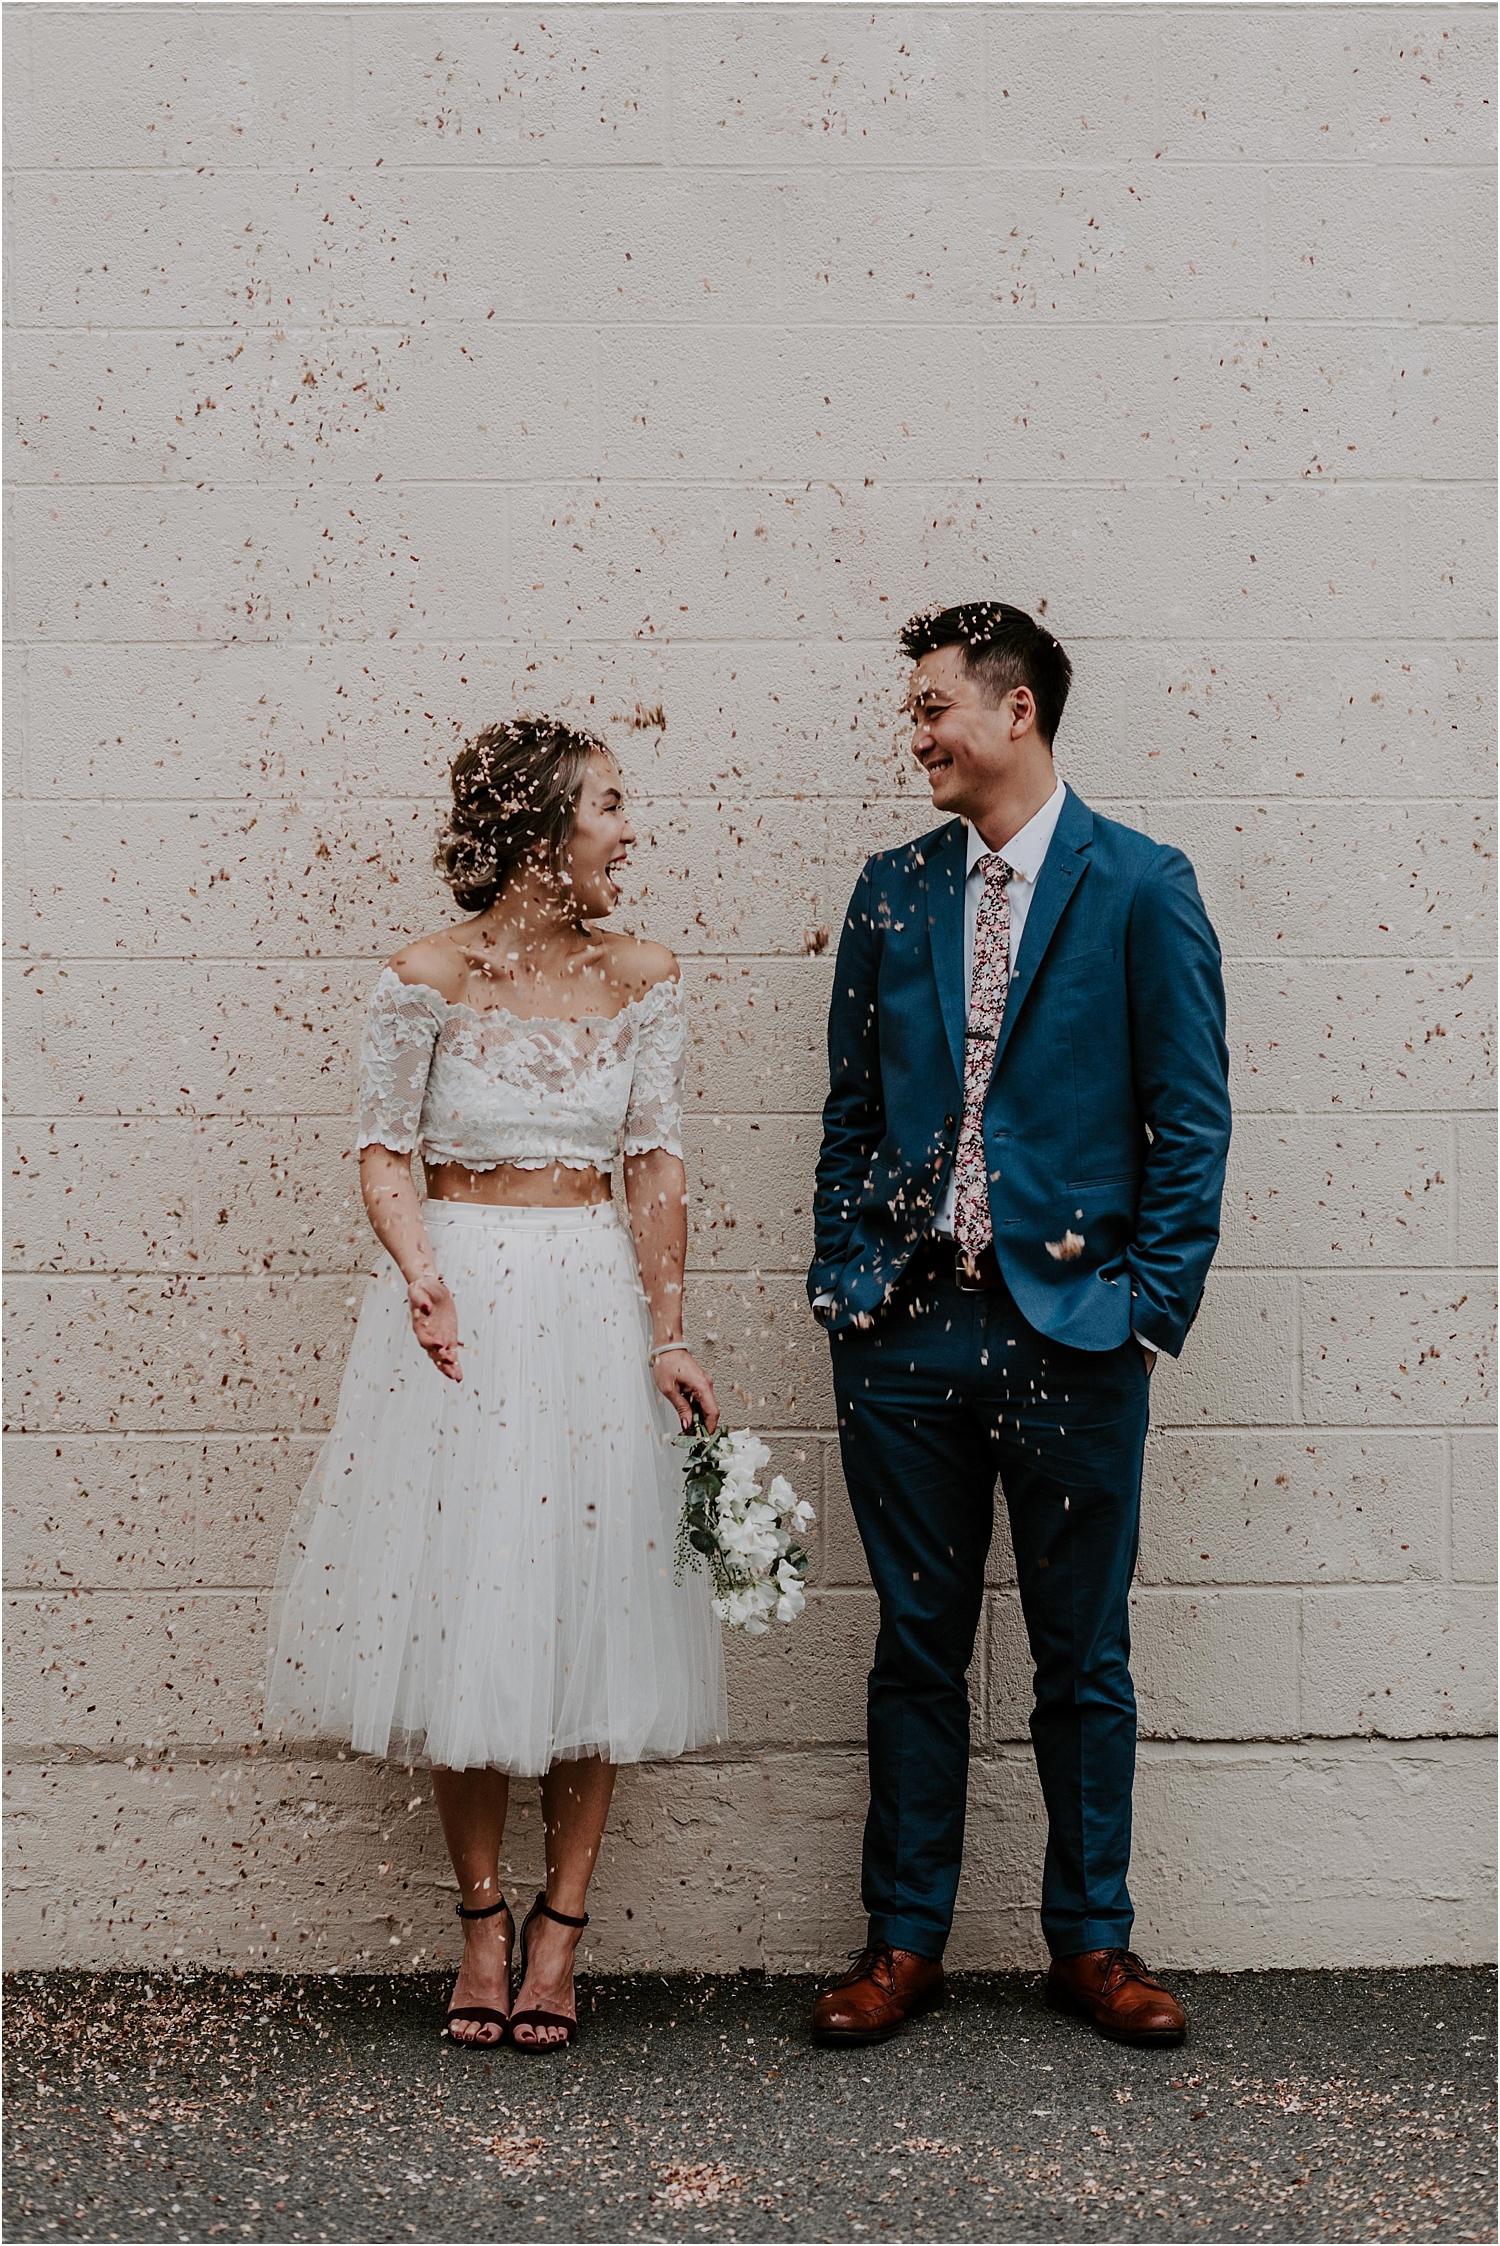 ANNIEANDPHUONG-bostonwedding-madelinerosephoto_0001.jpg